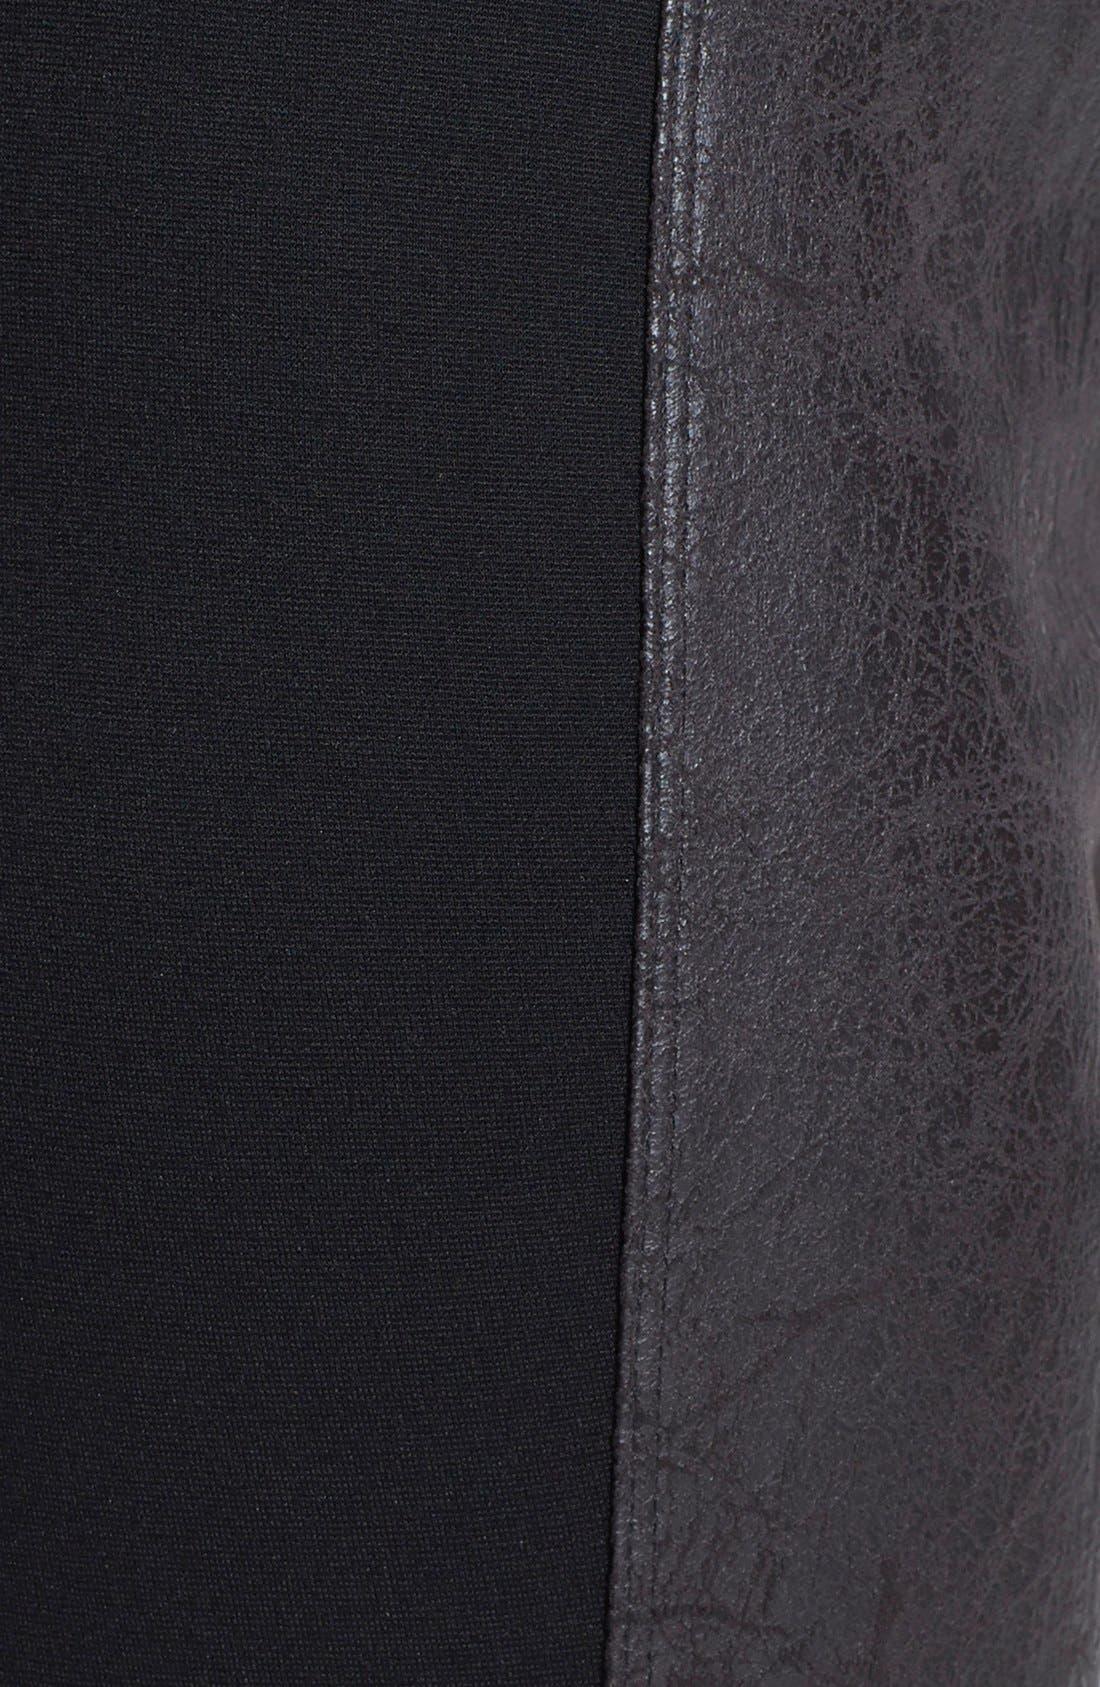 'Rue' Faux Leather & Ponte Knit Leggings,                             Alternate thumbnail 4, color,                             001